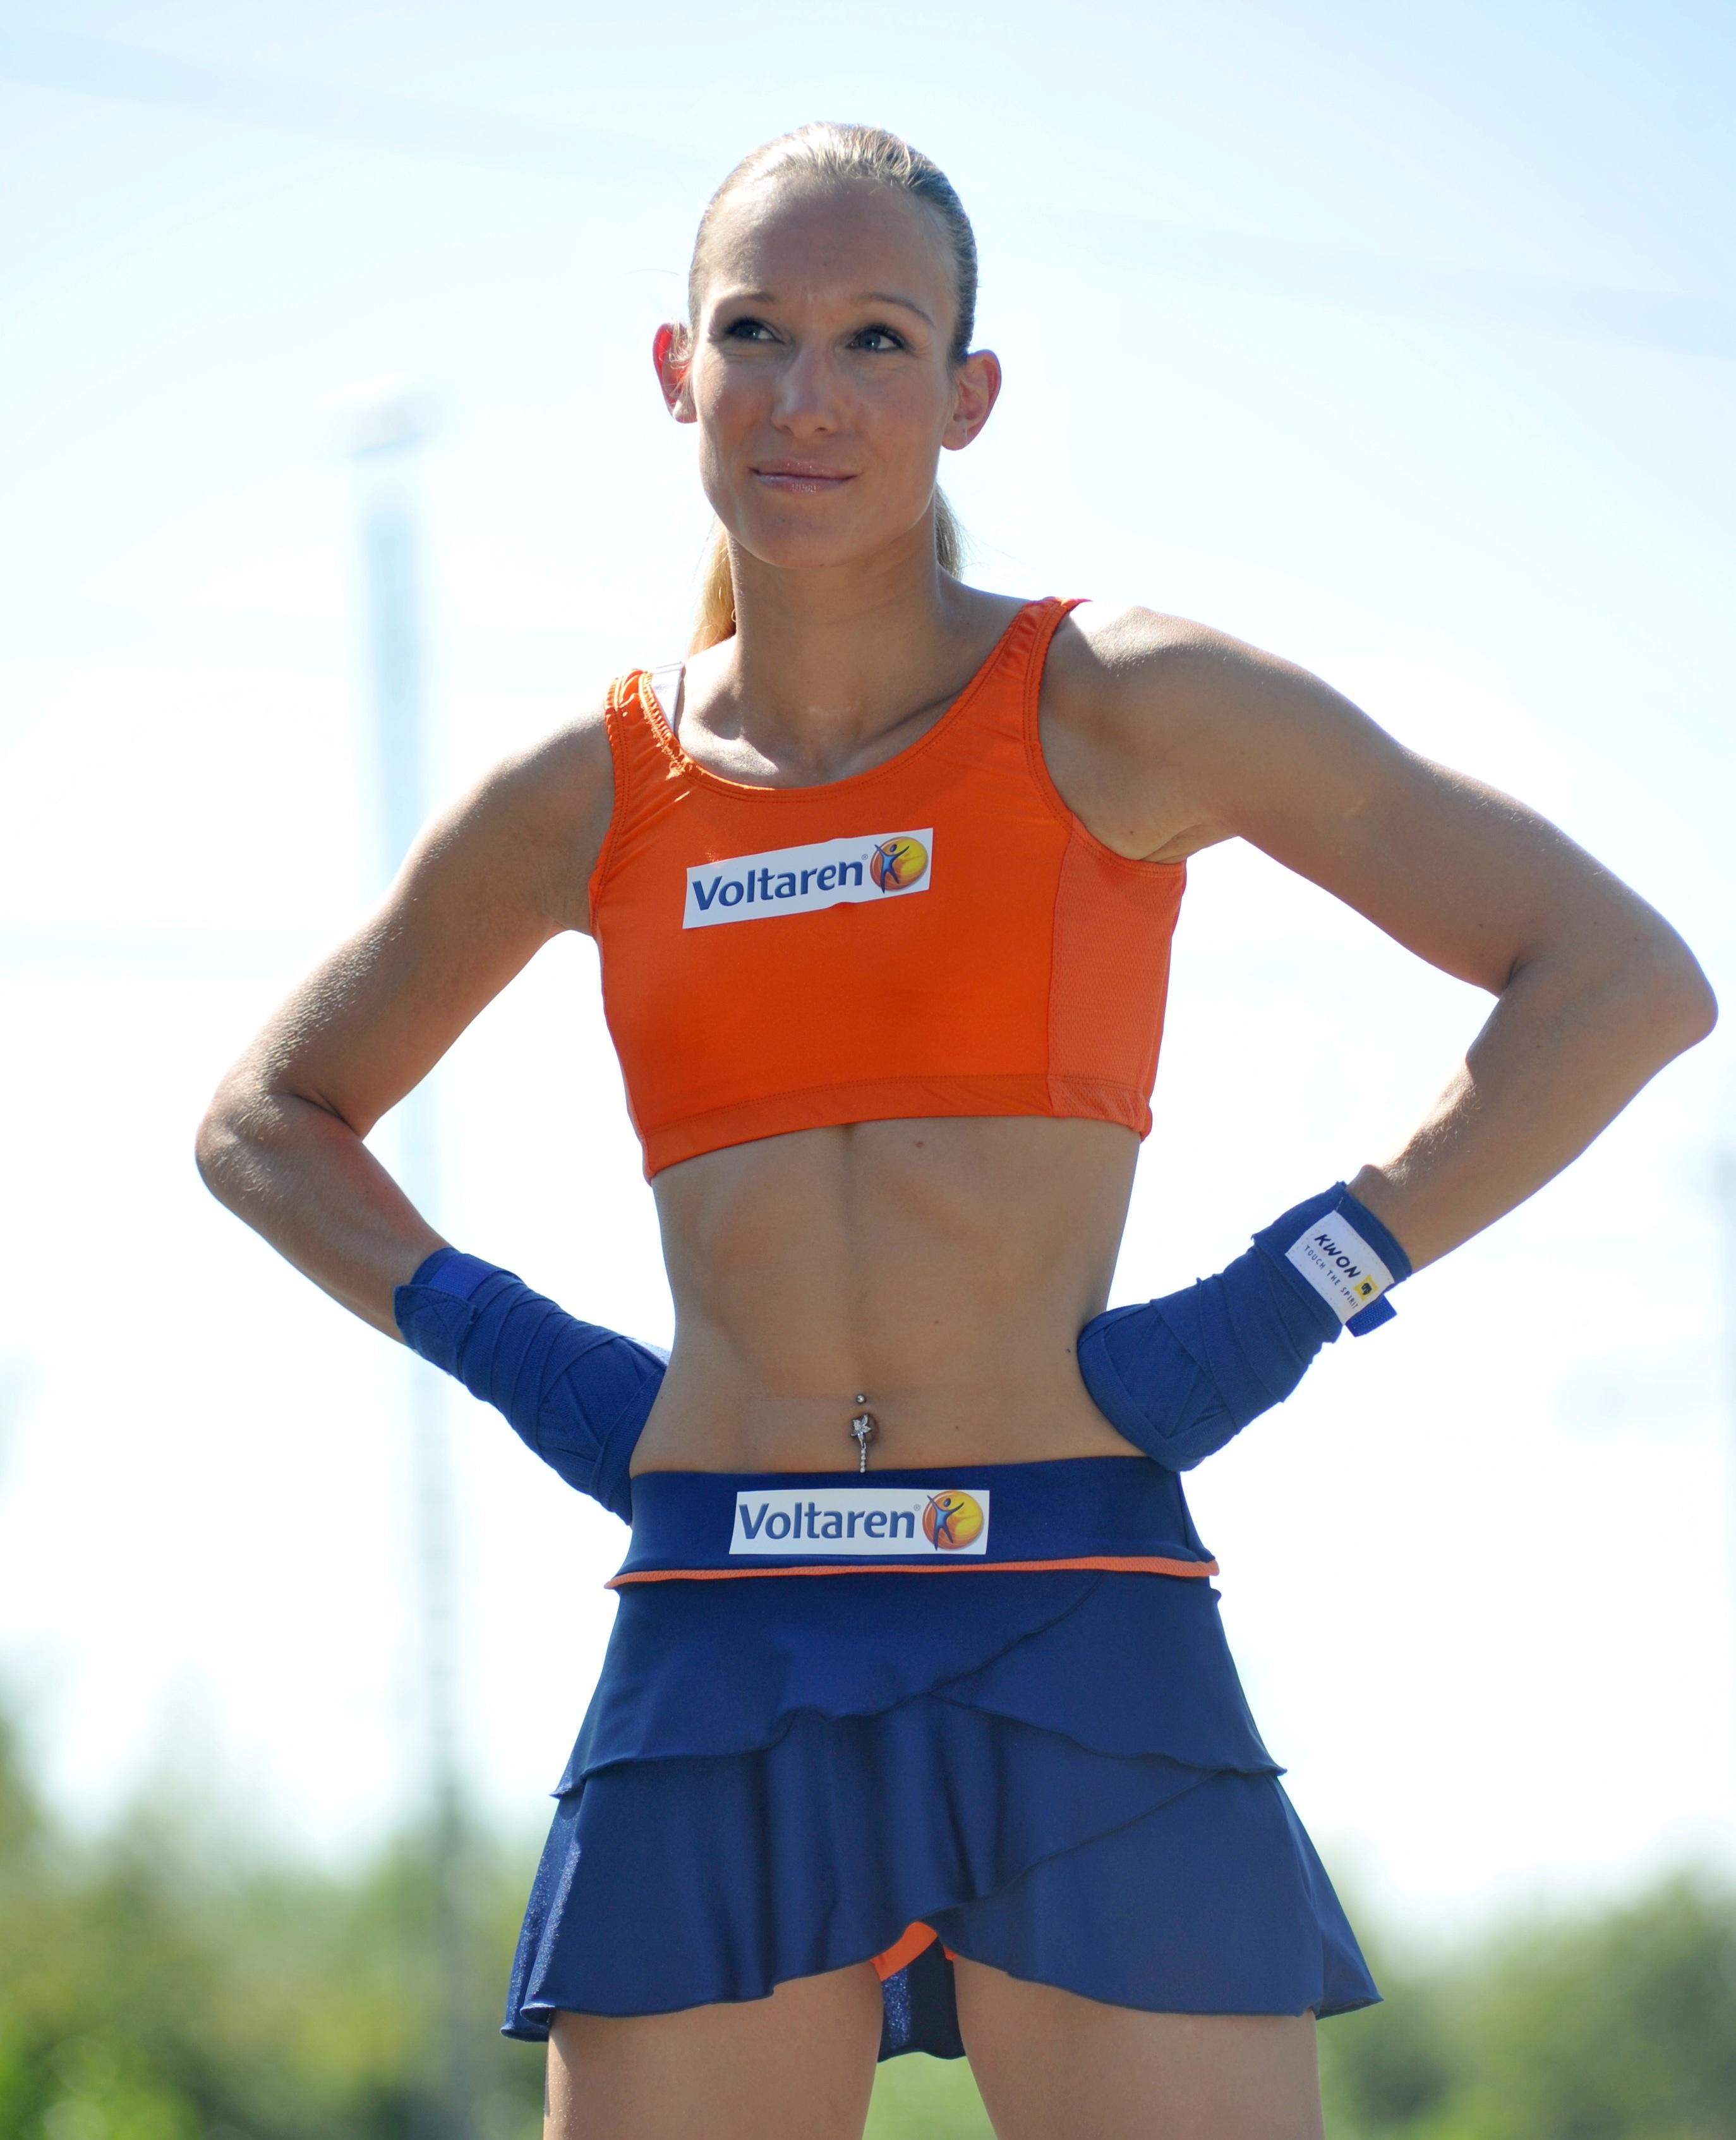 Christine Theiss Kickbox Photoshoot 2010 03